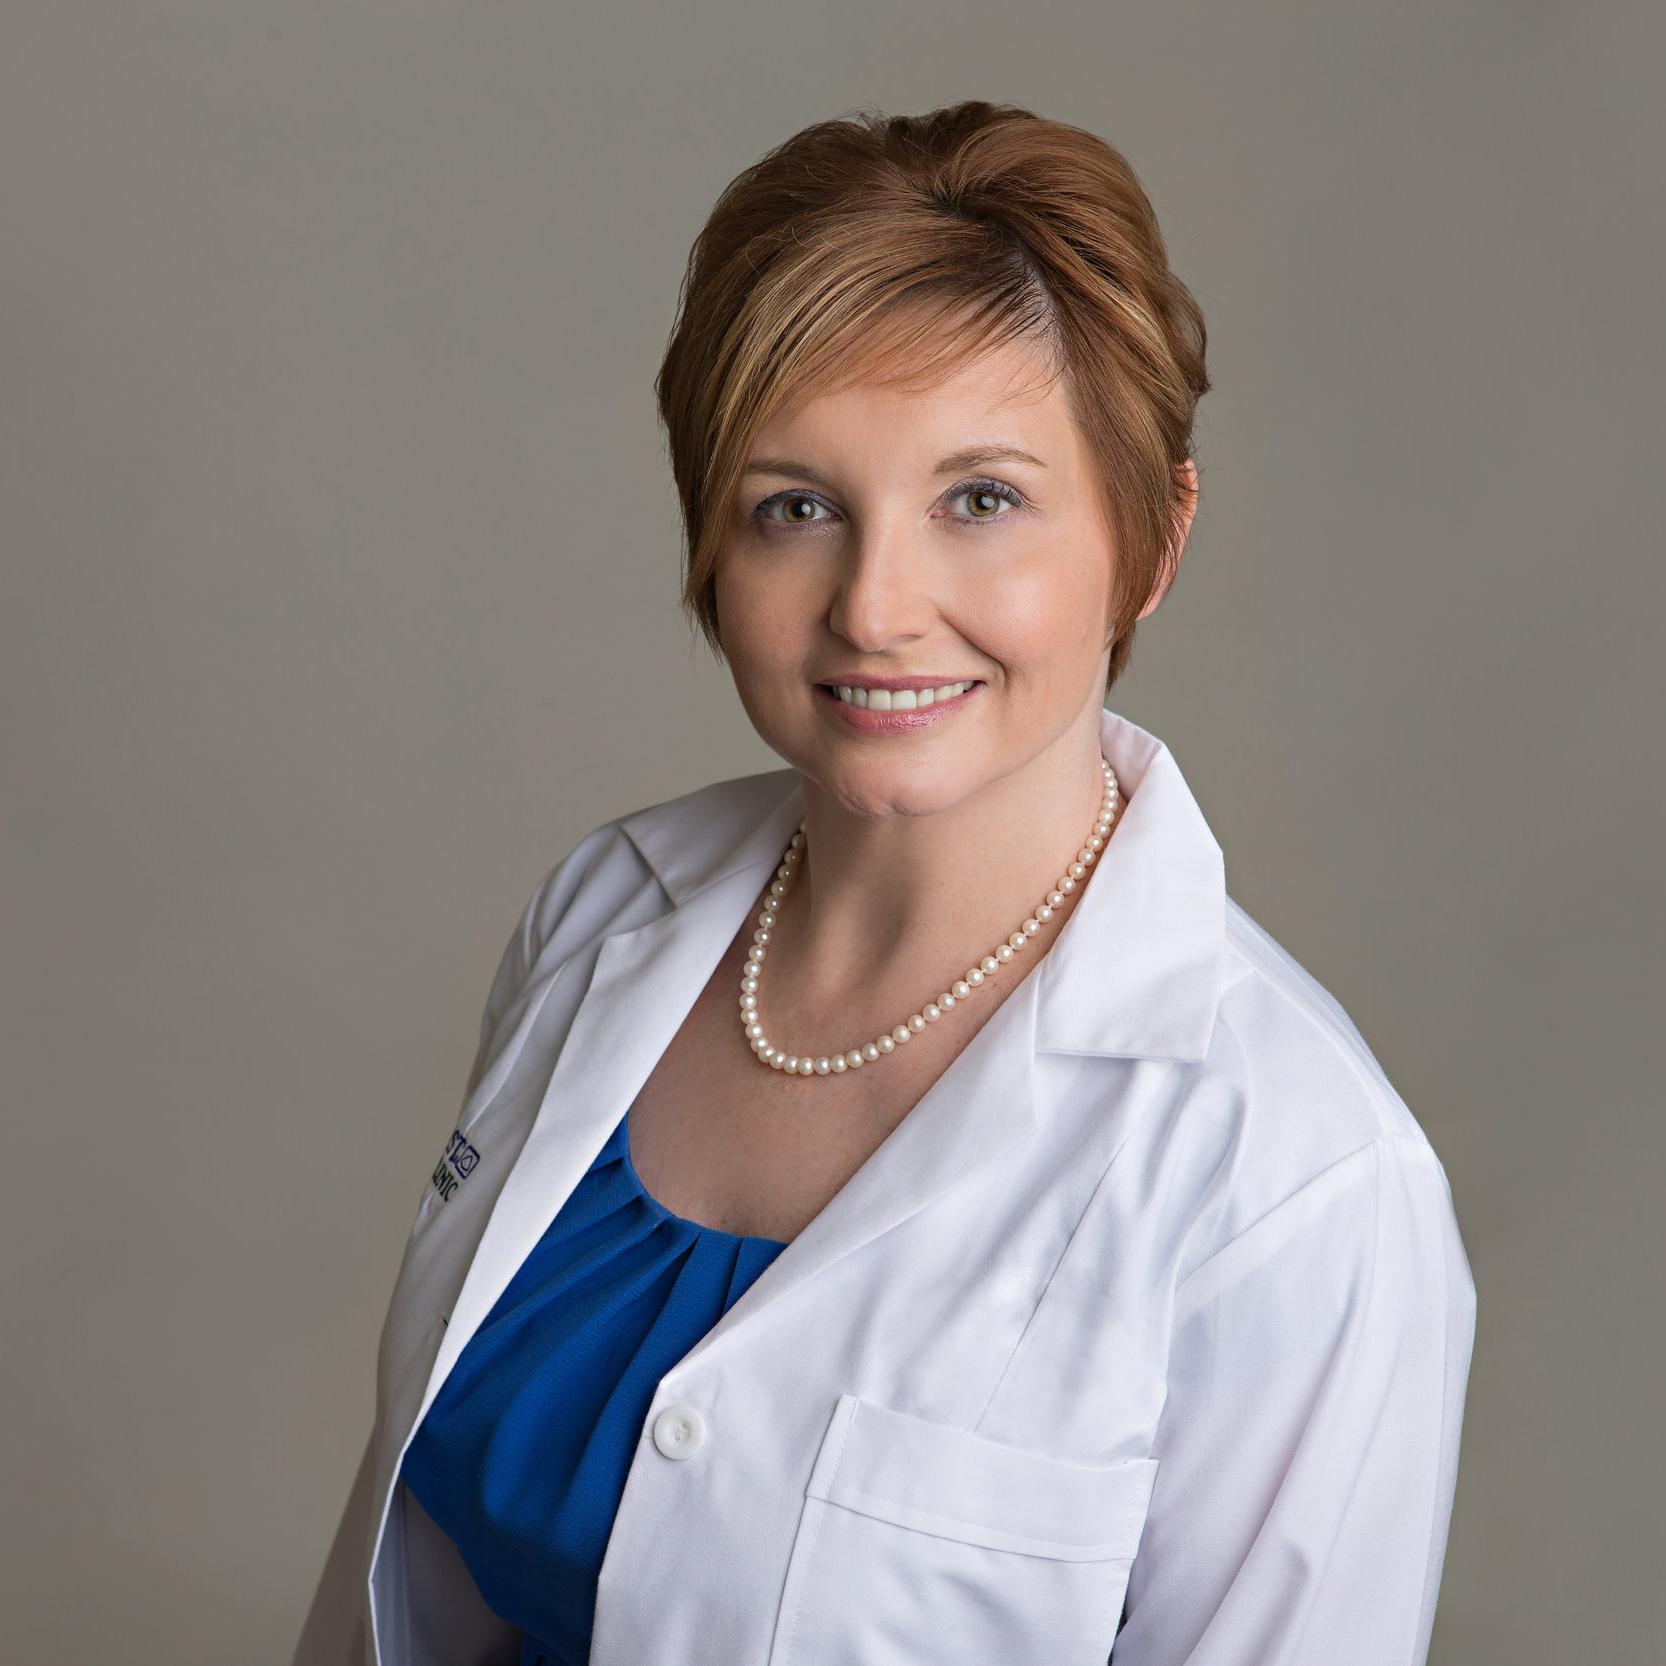 Dr. Leslie McCasland - Board Certified in Rheumatology and Internal Medicine